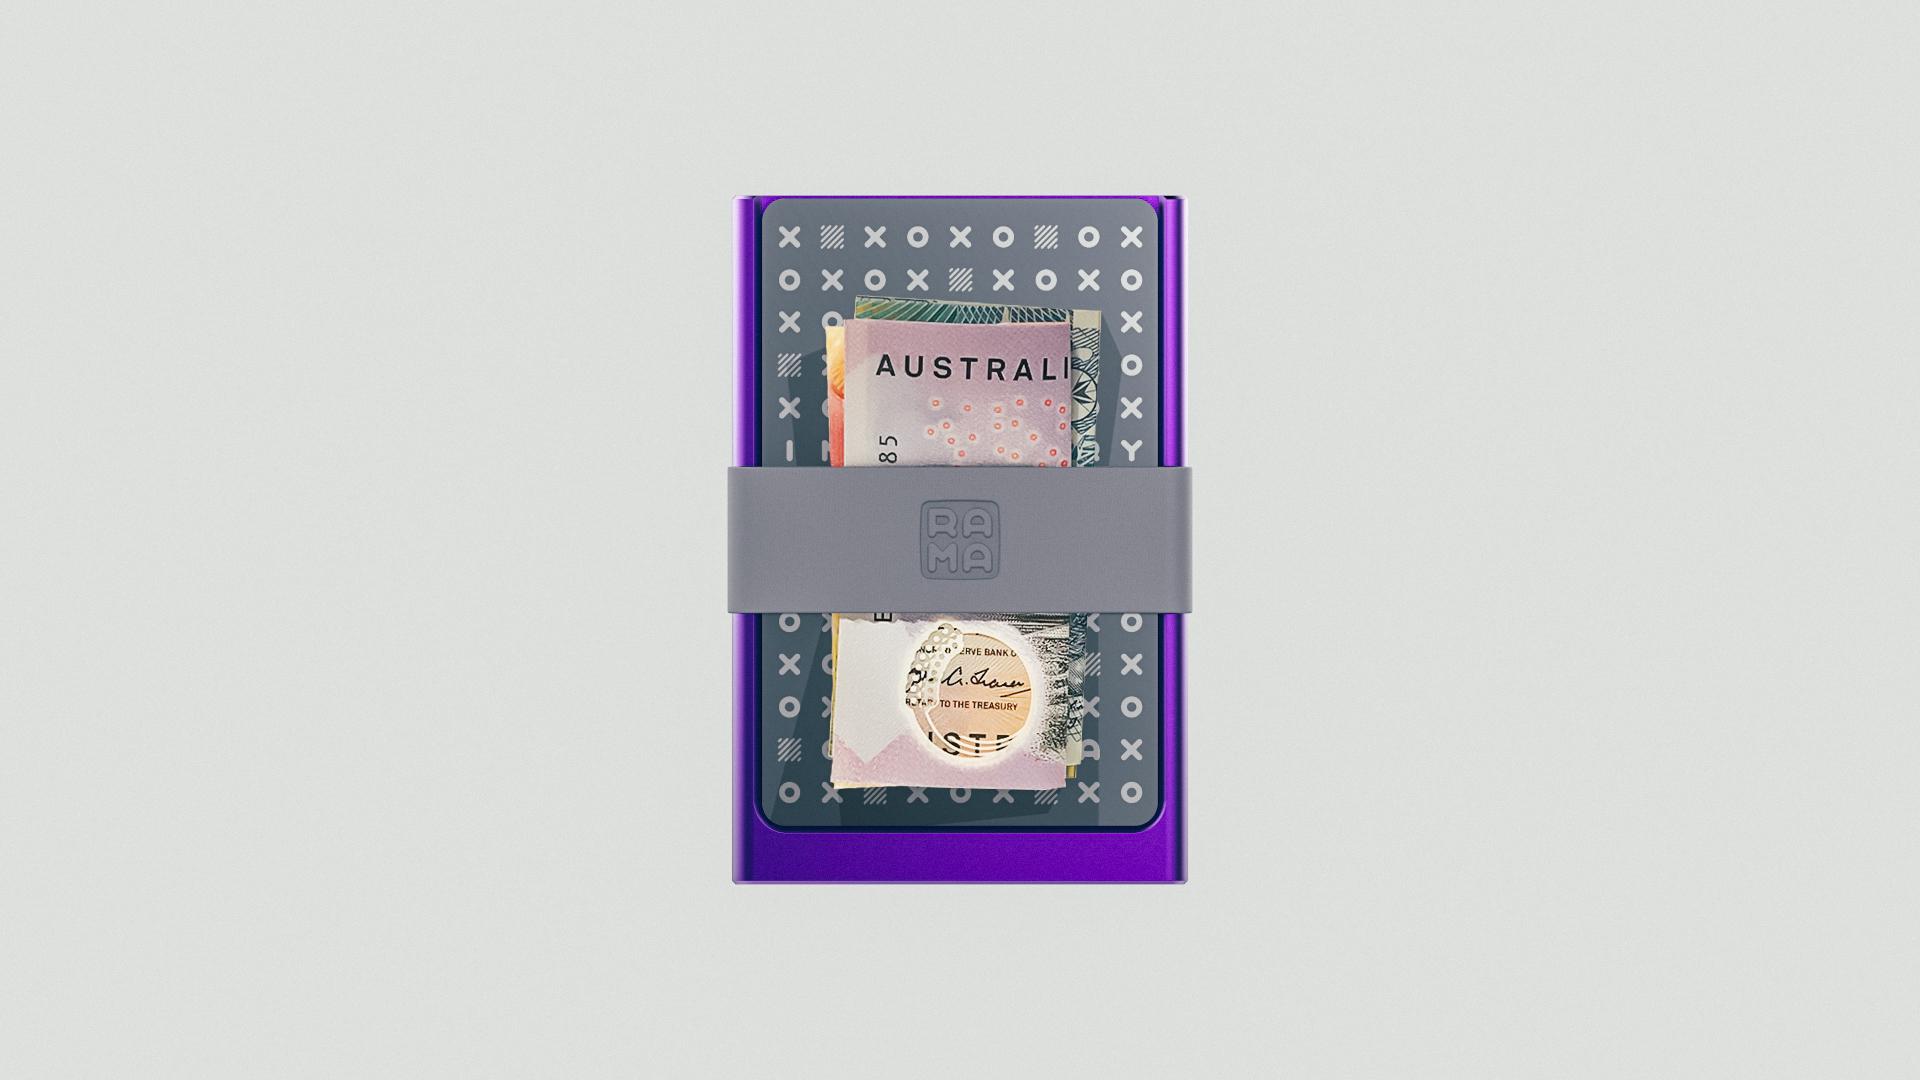 RAMA-PHOTO-RAMA-WALLET-01-W-CARD.1767.jpg